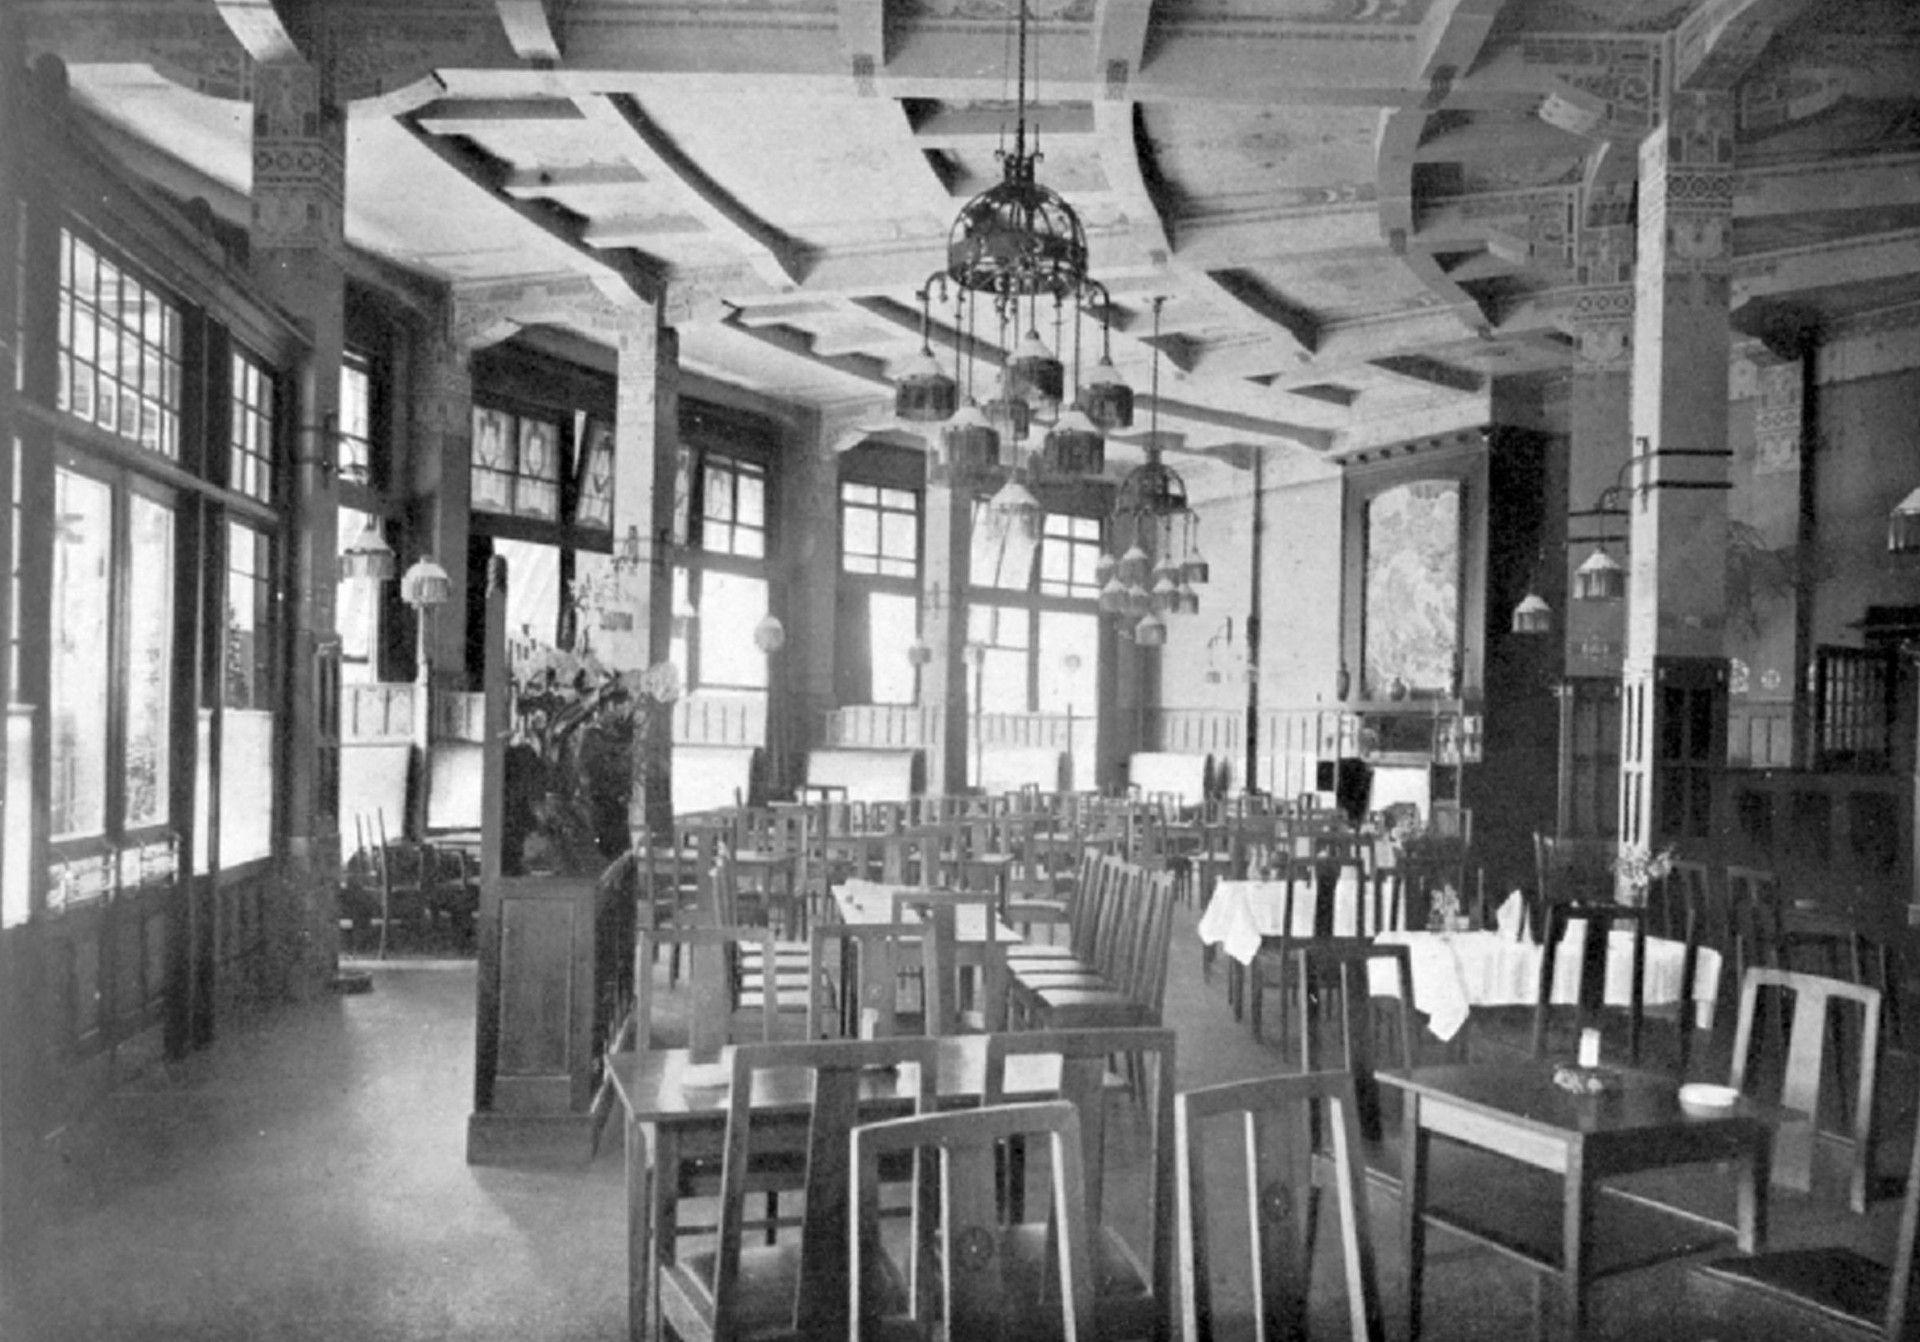 station hofplein interieur voor 1940